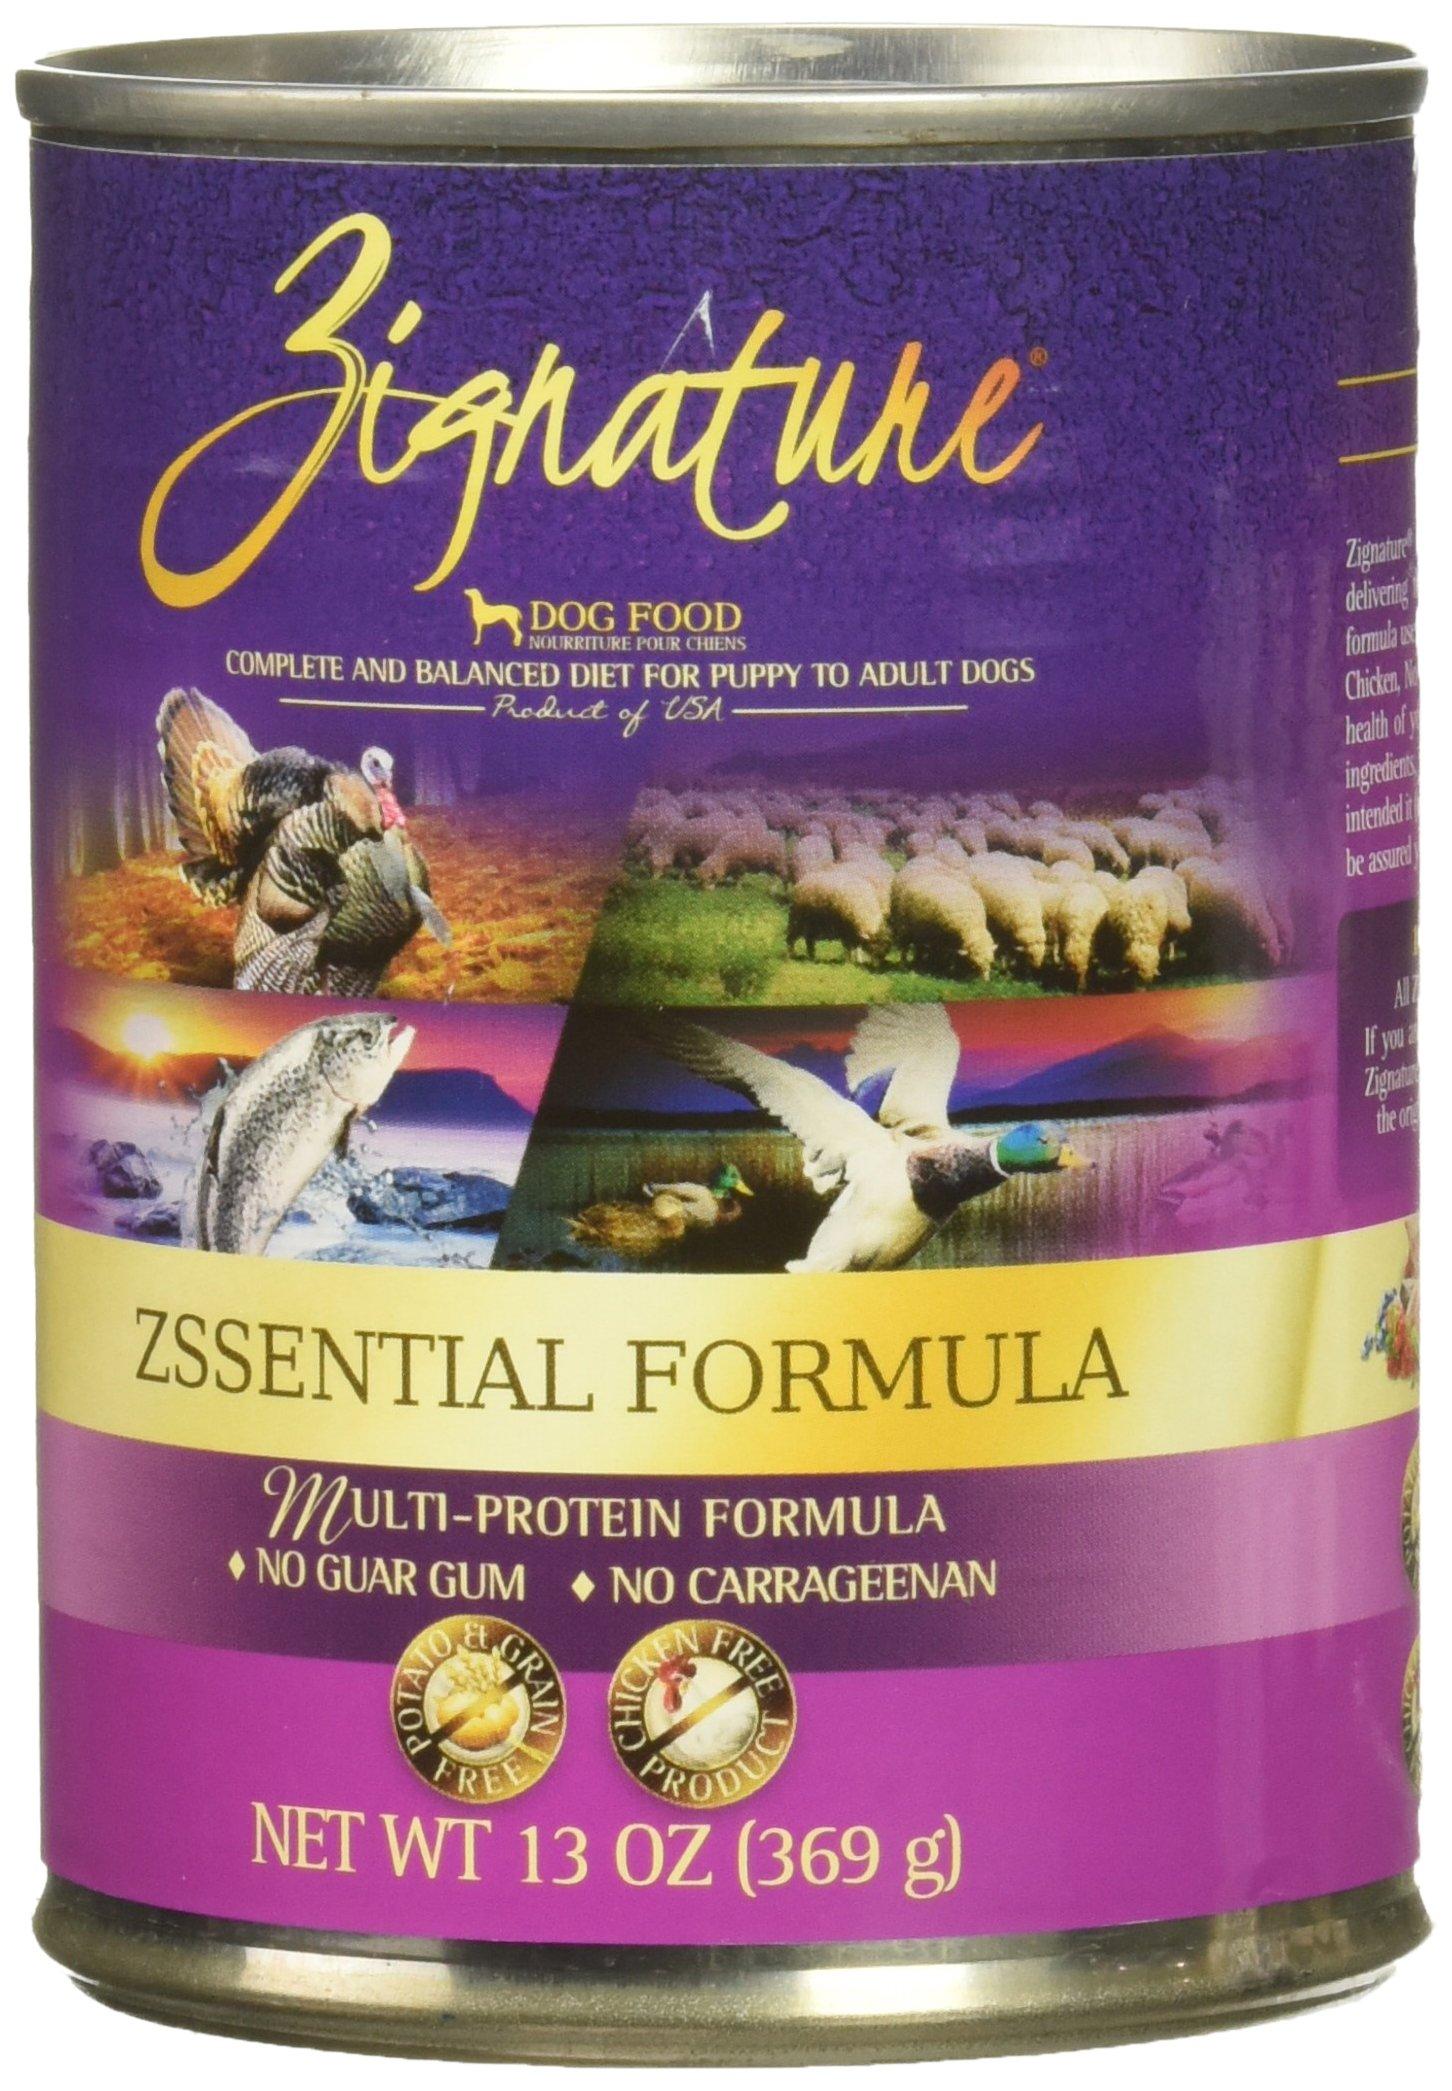 Zignature Grain Free Zsssentials Canned Dog Food 13oz,12 pack